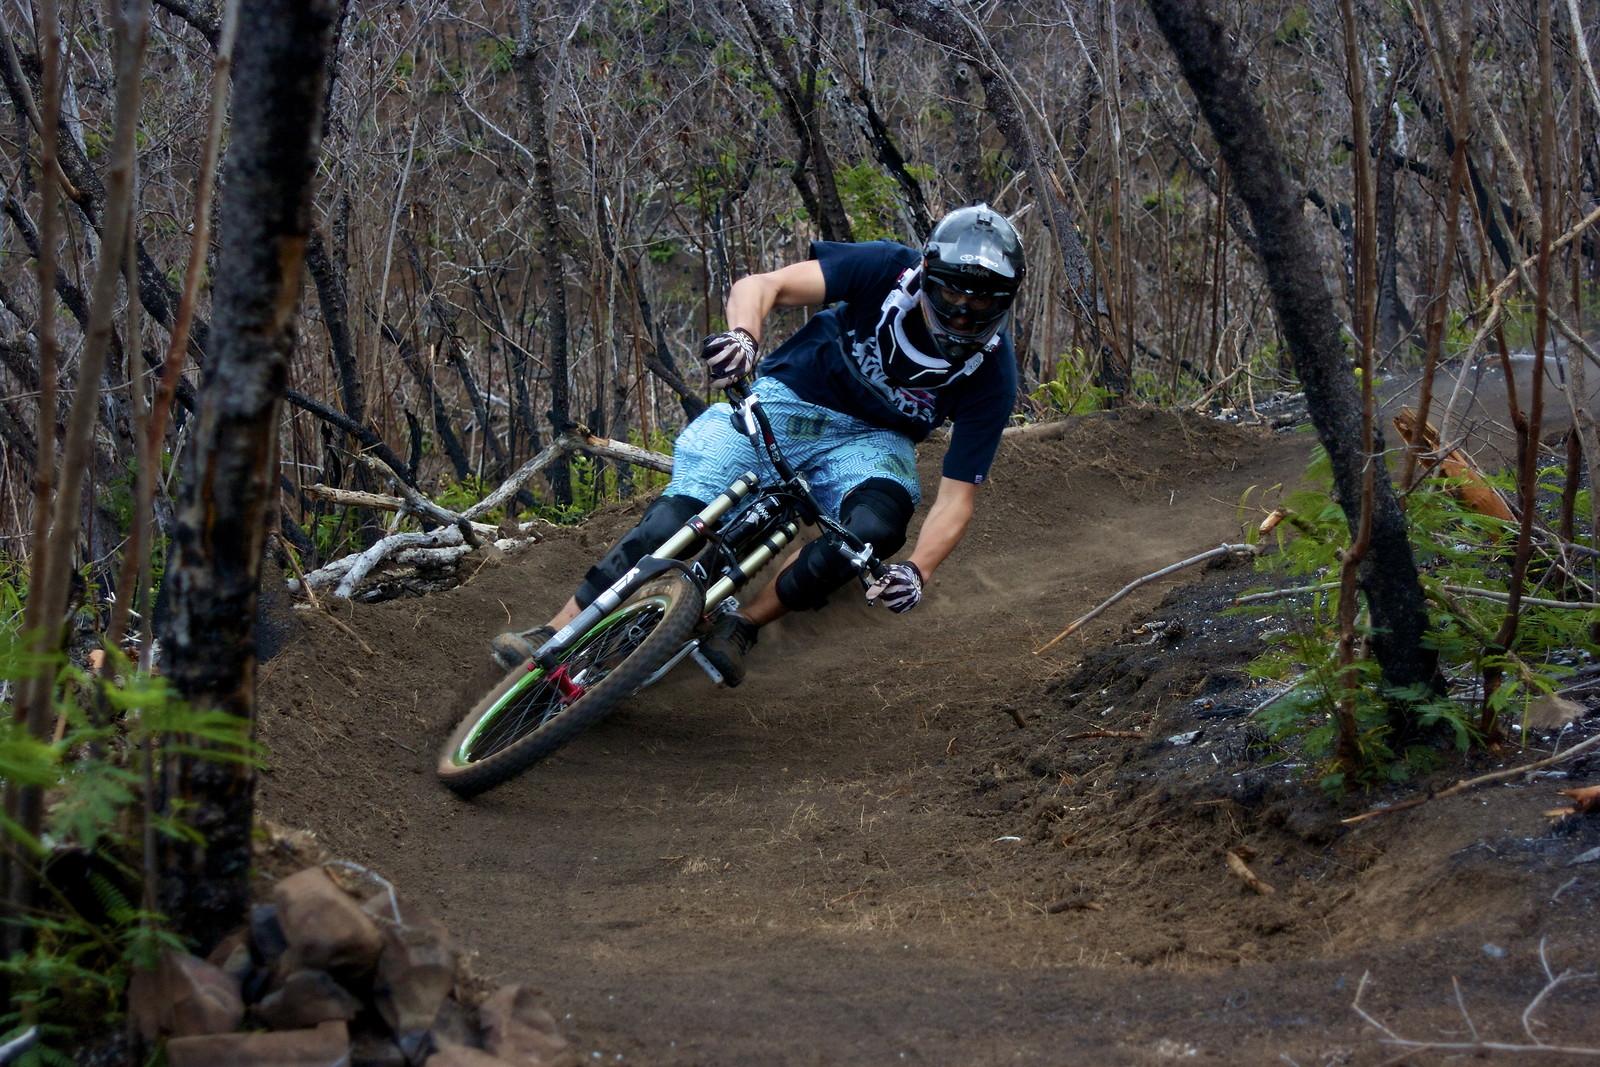 fresh dirt - thebyker - Mountain Biking Pictures - Vital MTB